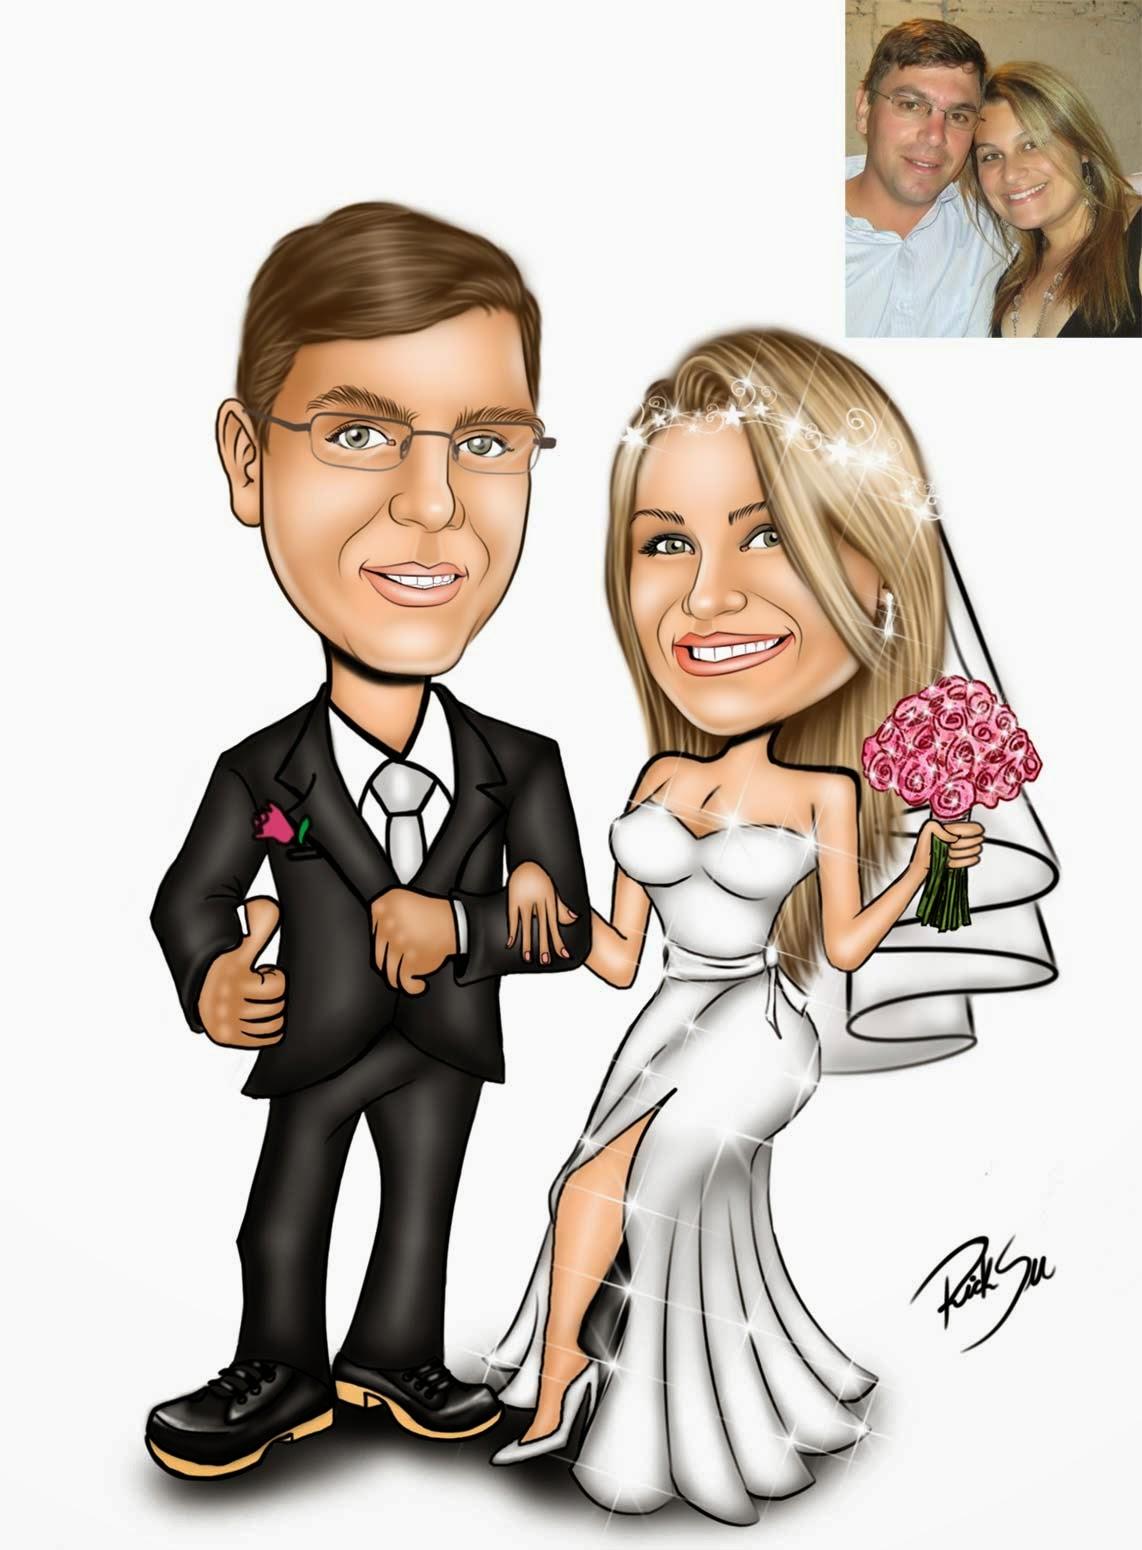 caricatura de casamento ricksu caricaturas